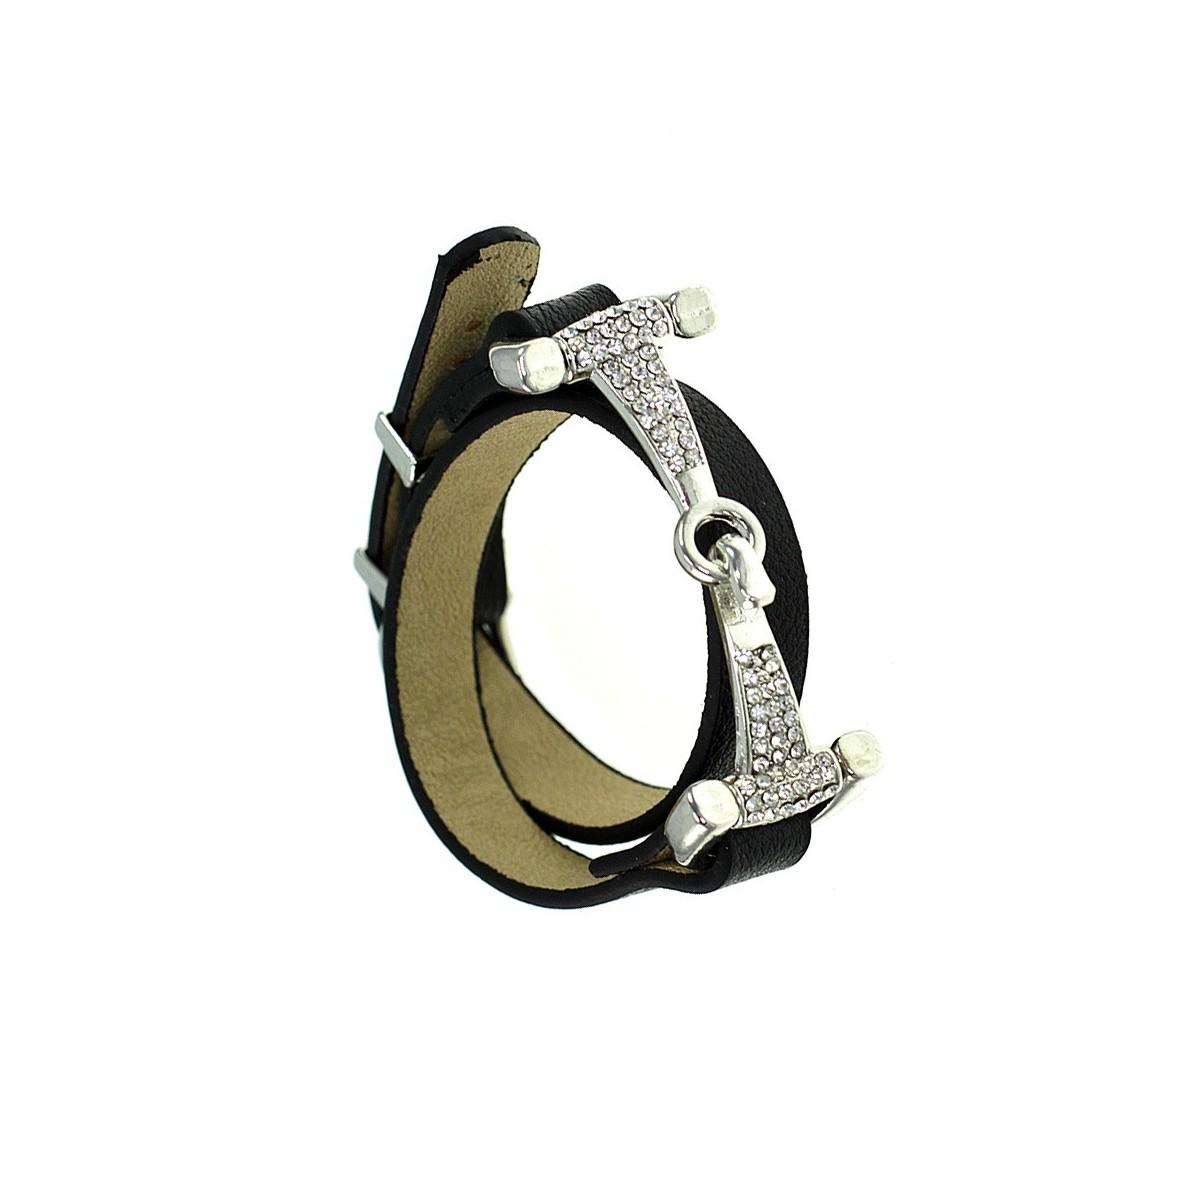 Bracelet femme en cuir véritable noir